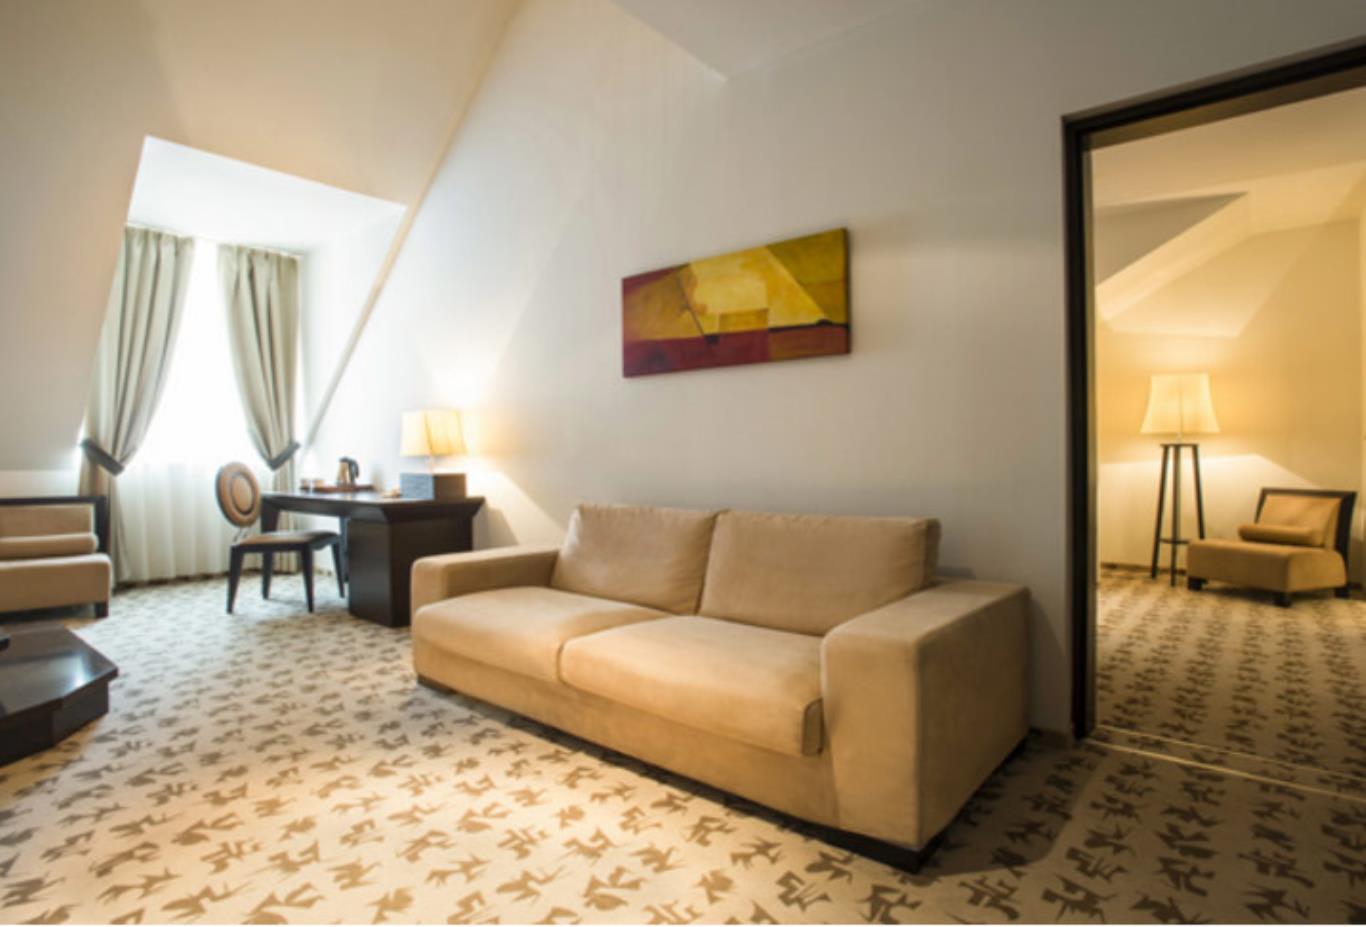 Duplex-Room-sitting